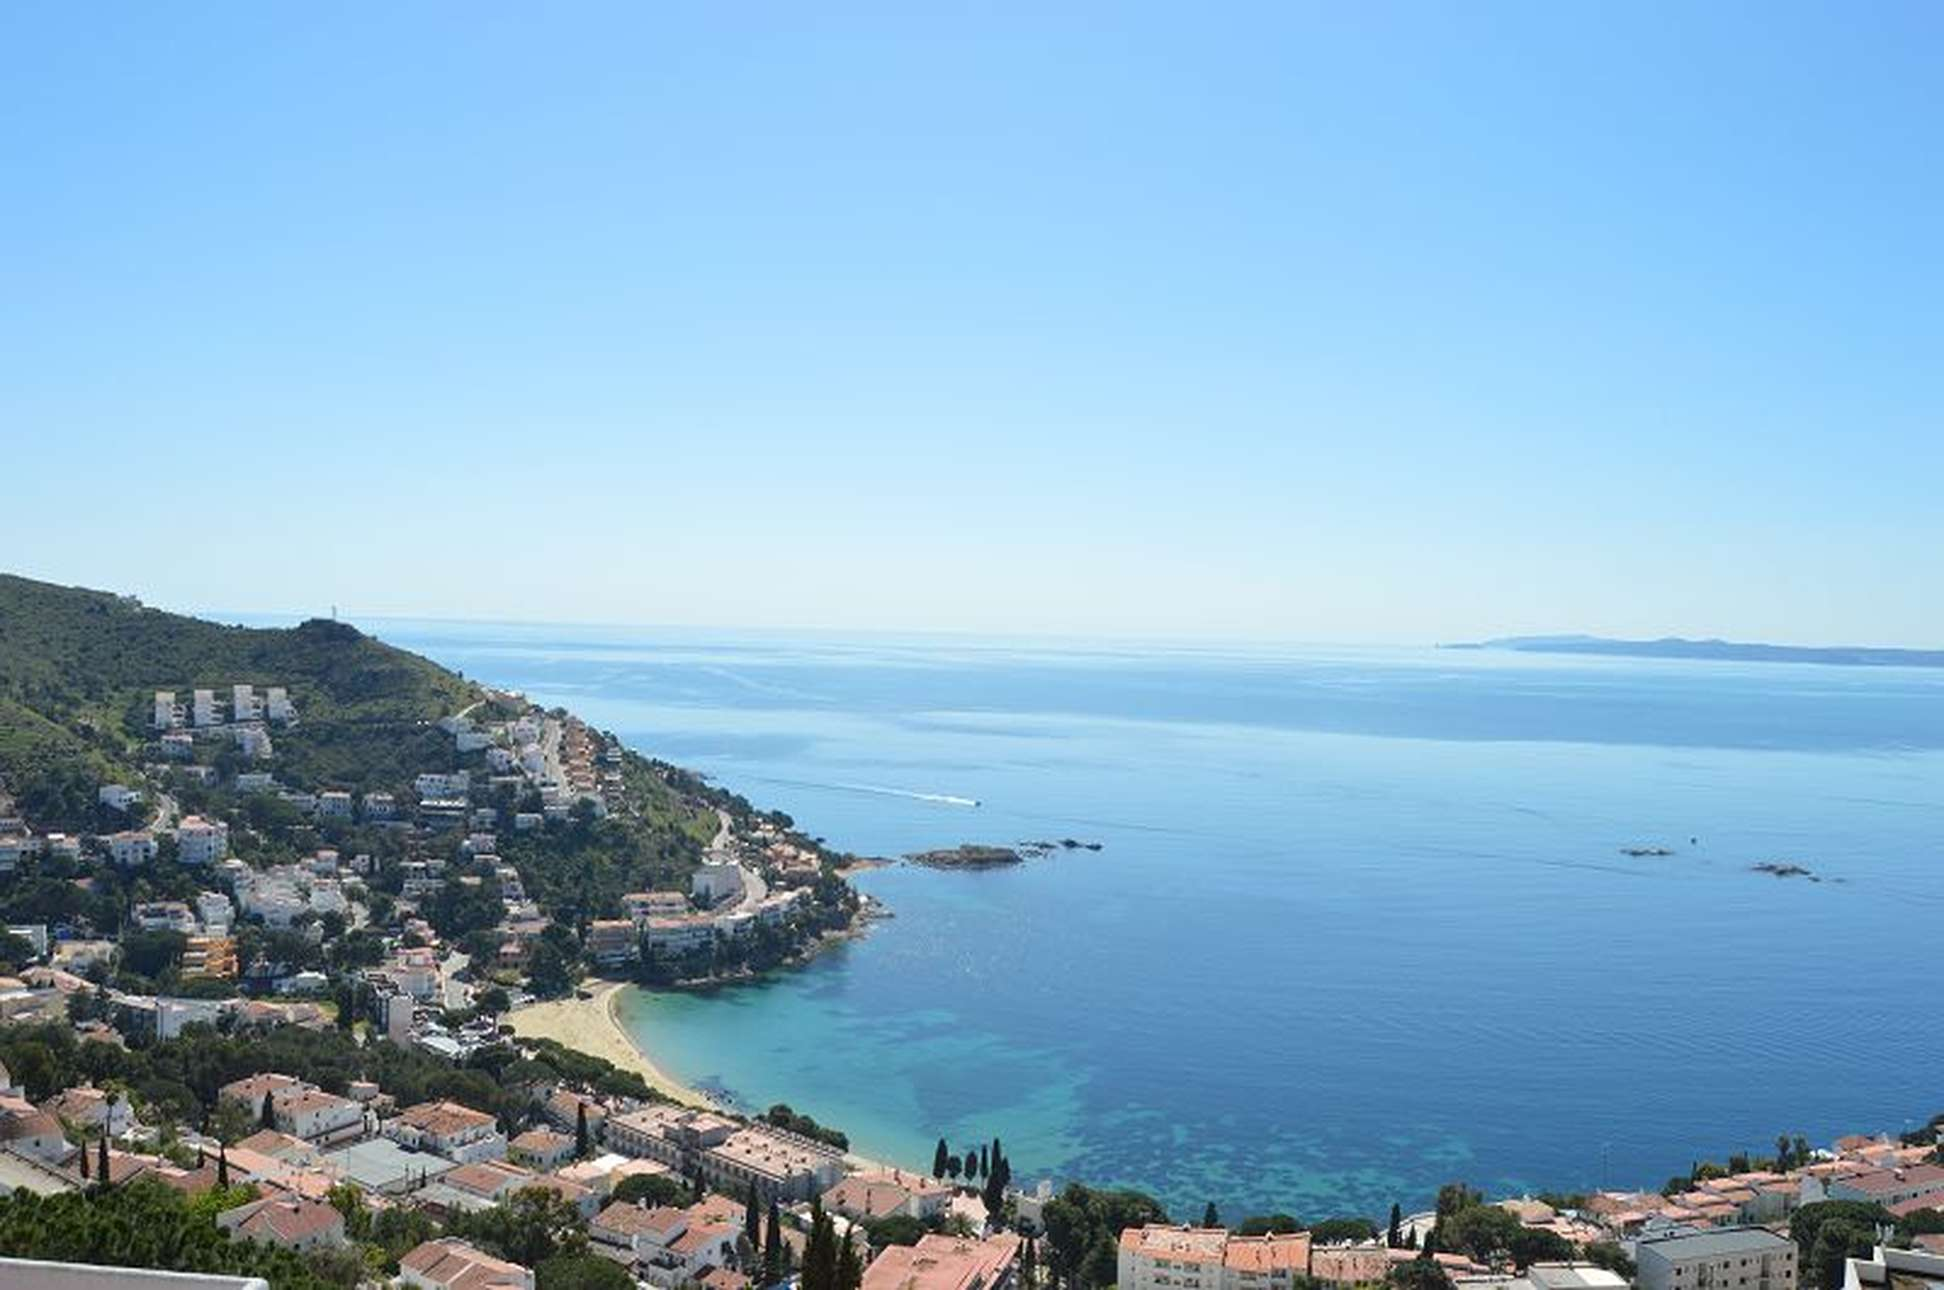 Appartement En Location Vacances à Roses Costa Brava